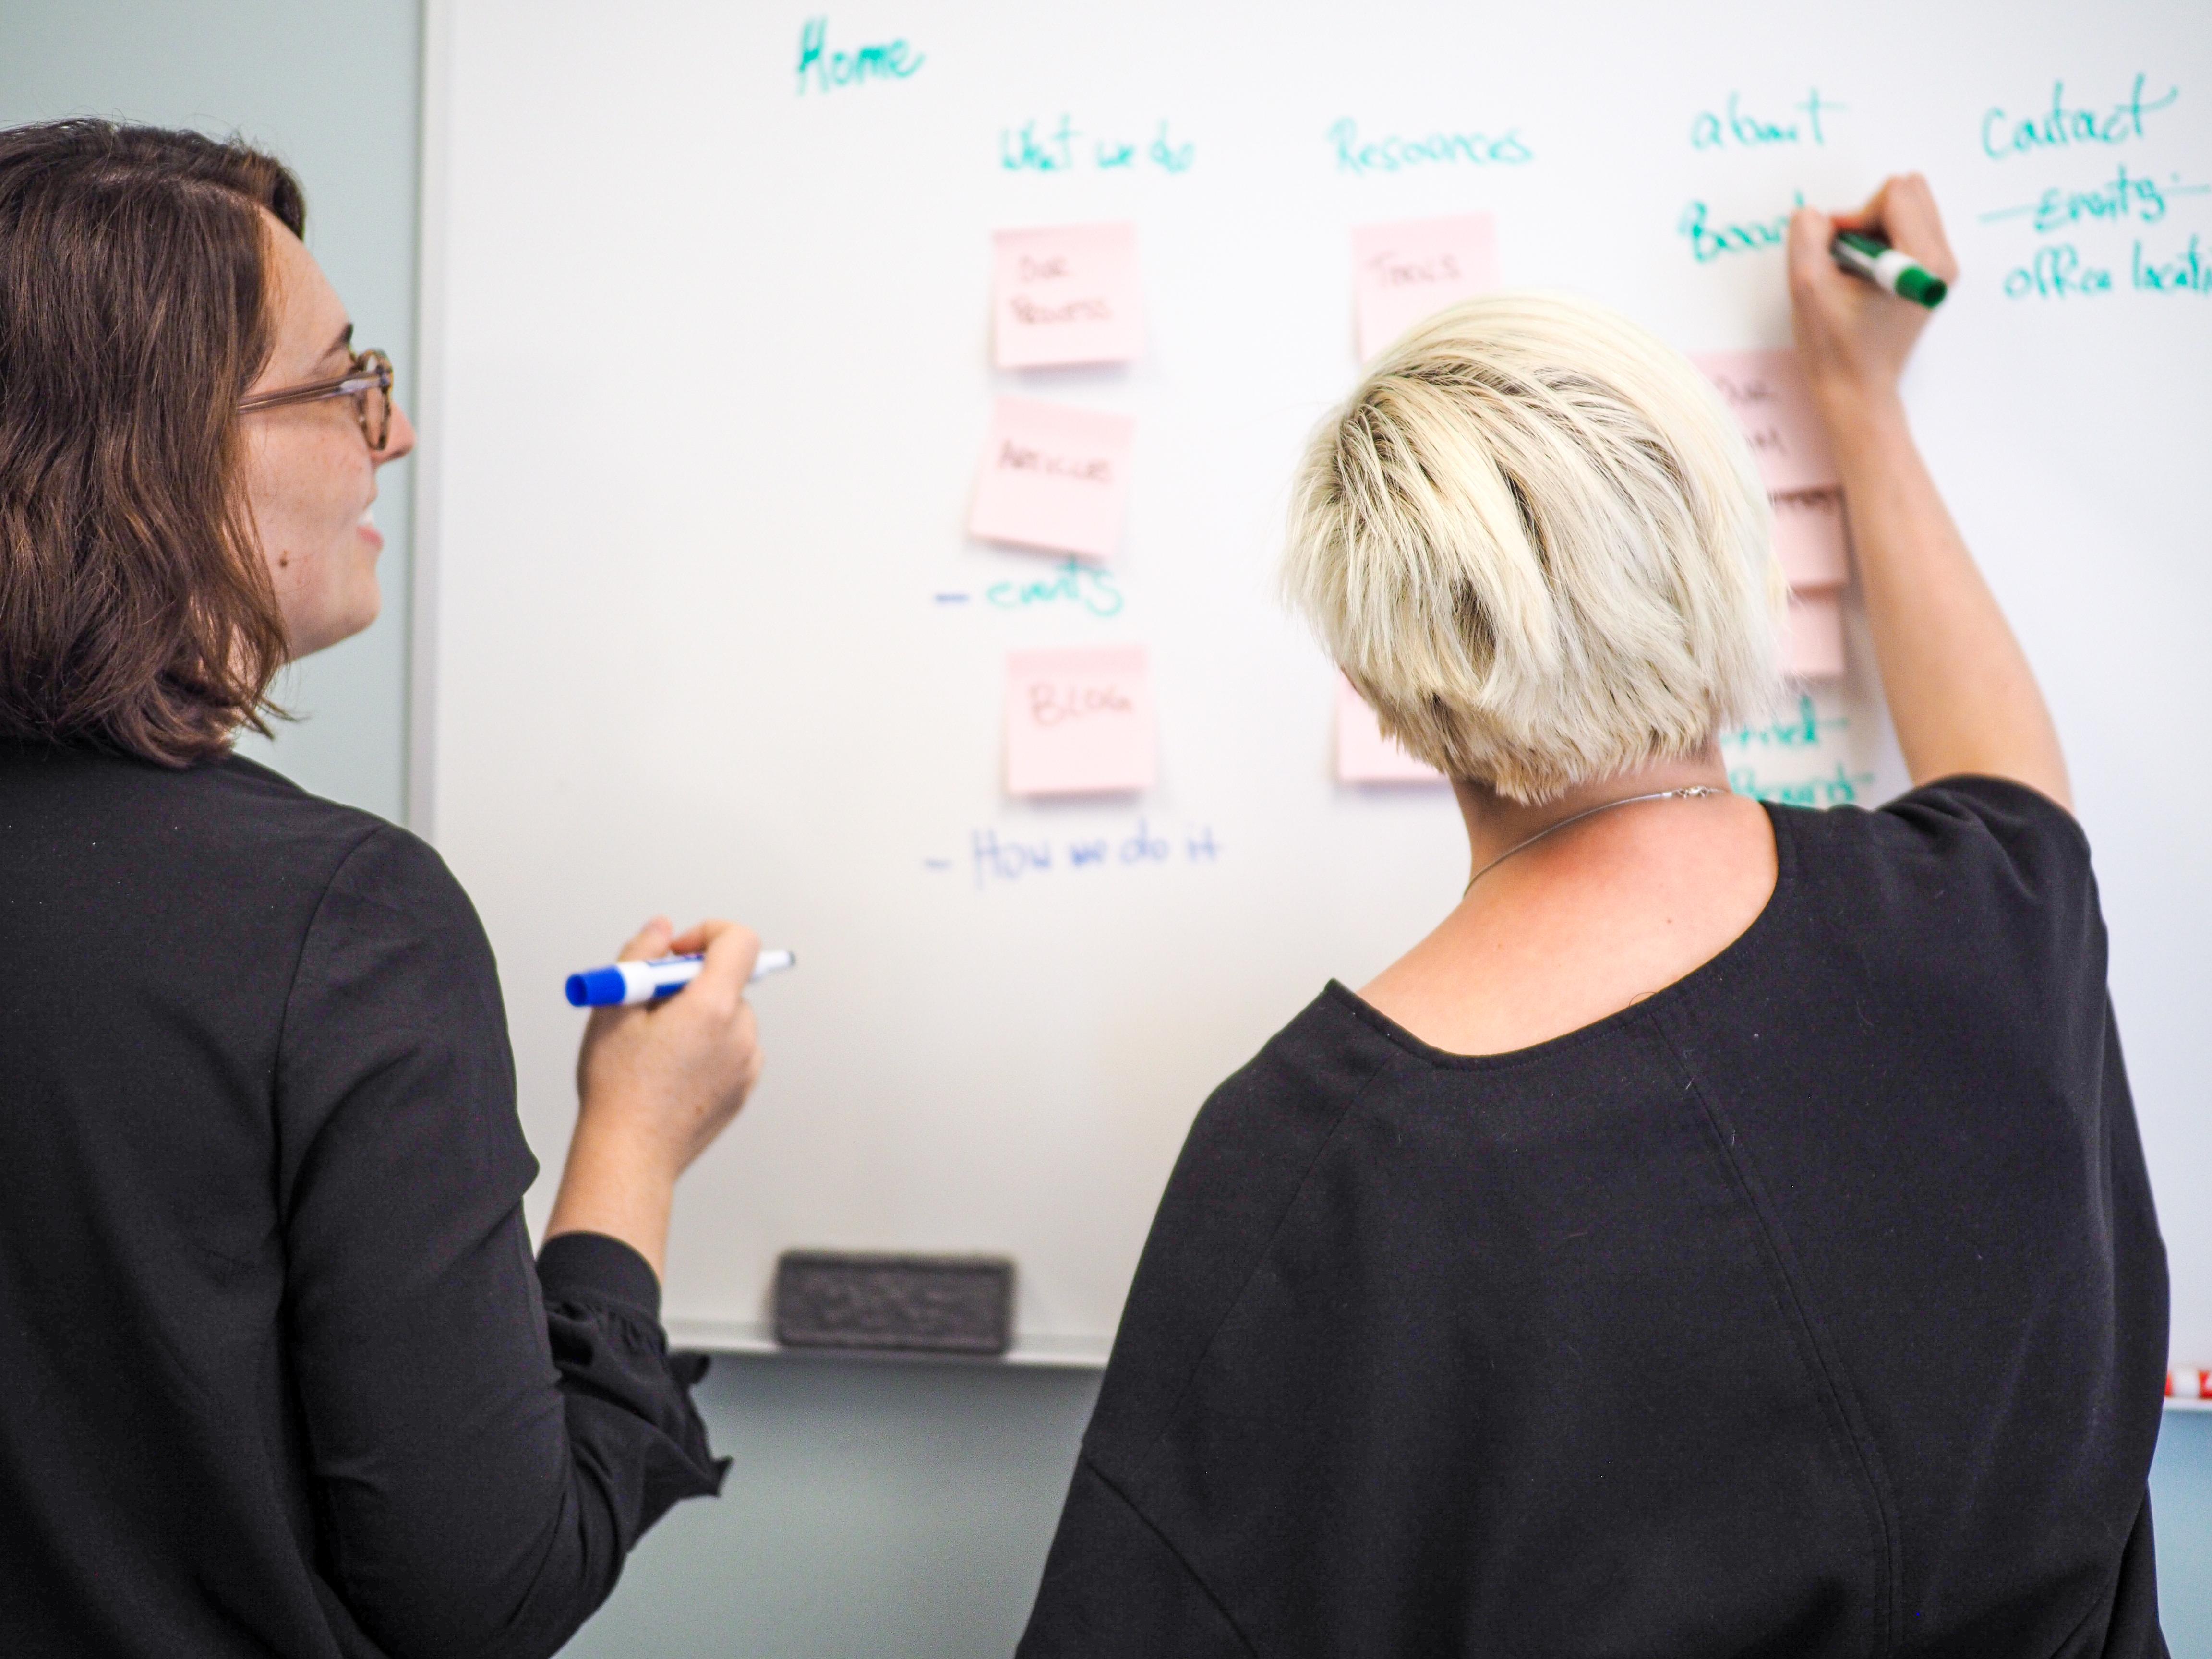 two women writing on a whiteboard